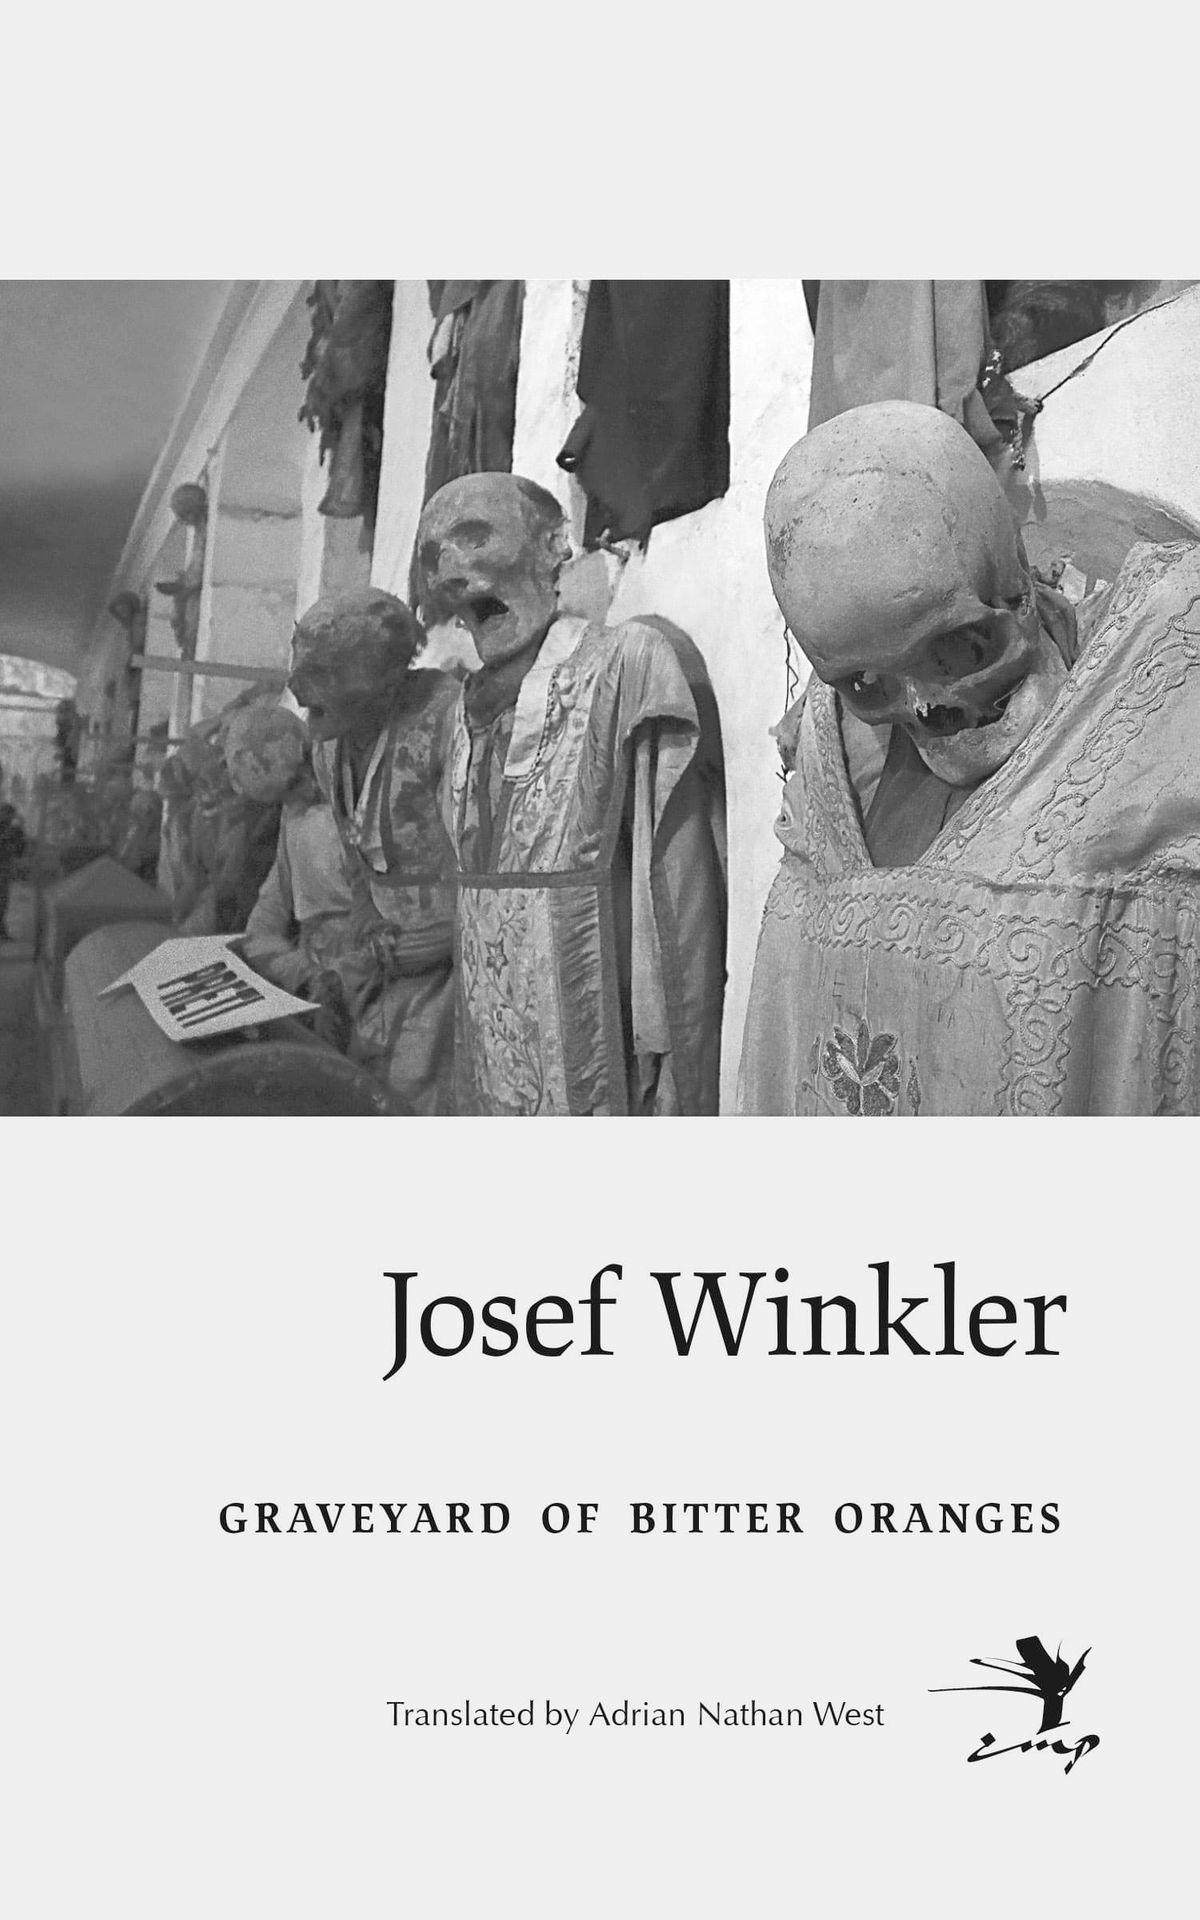 Graveyard of Bitter Oranges